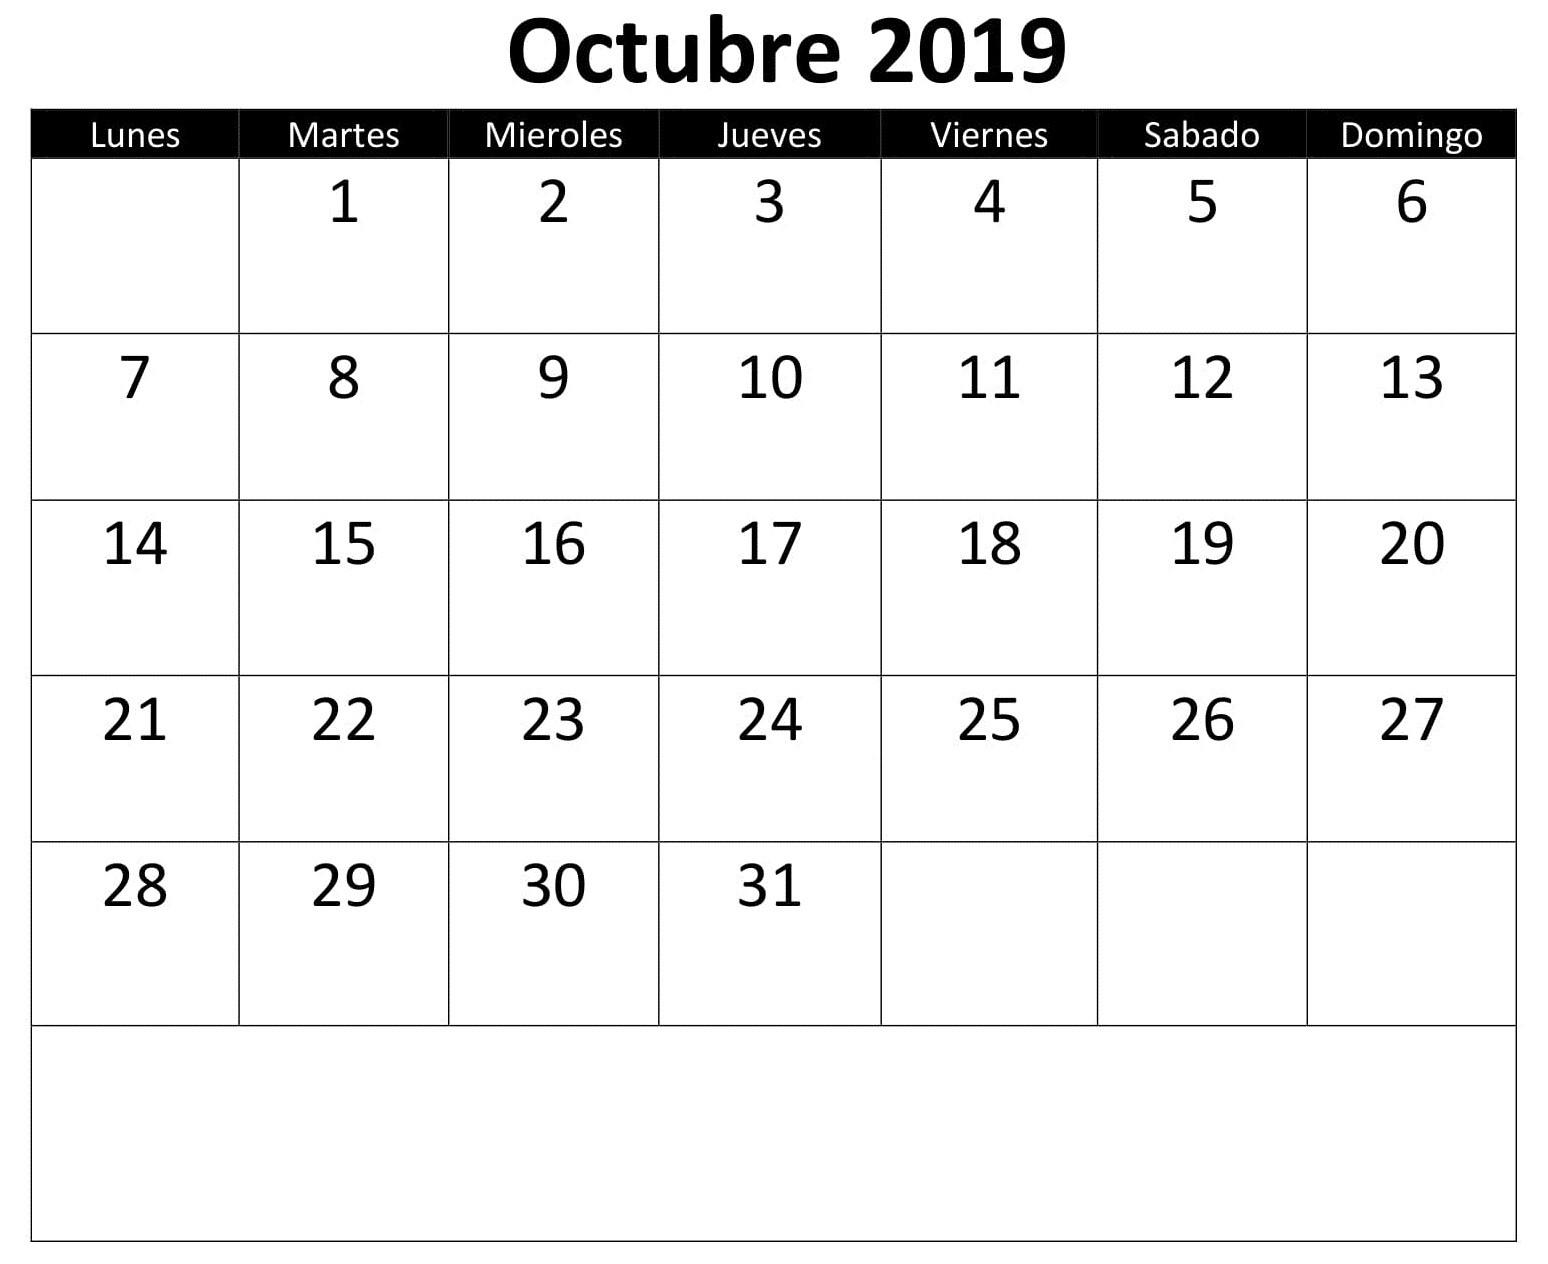 Imprimir Calendario De Marzo 2019 Más Caliente Calendario De Octubre 2019 Of Imprimir Calendario De Marzo 2019 Más Recientes January Calendar 2019 with Holidays January2019 January